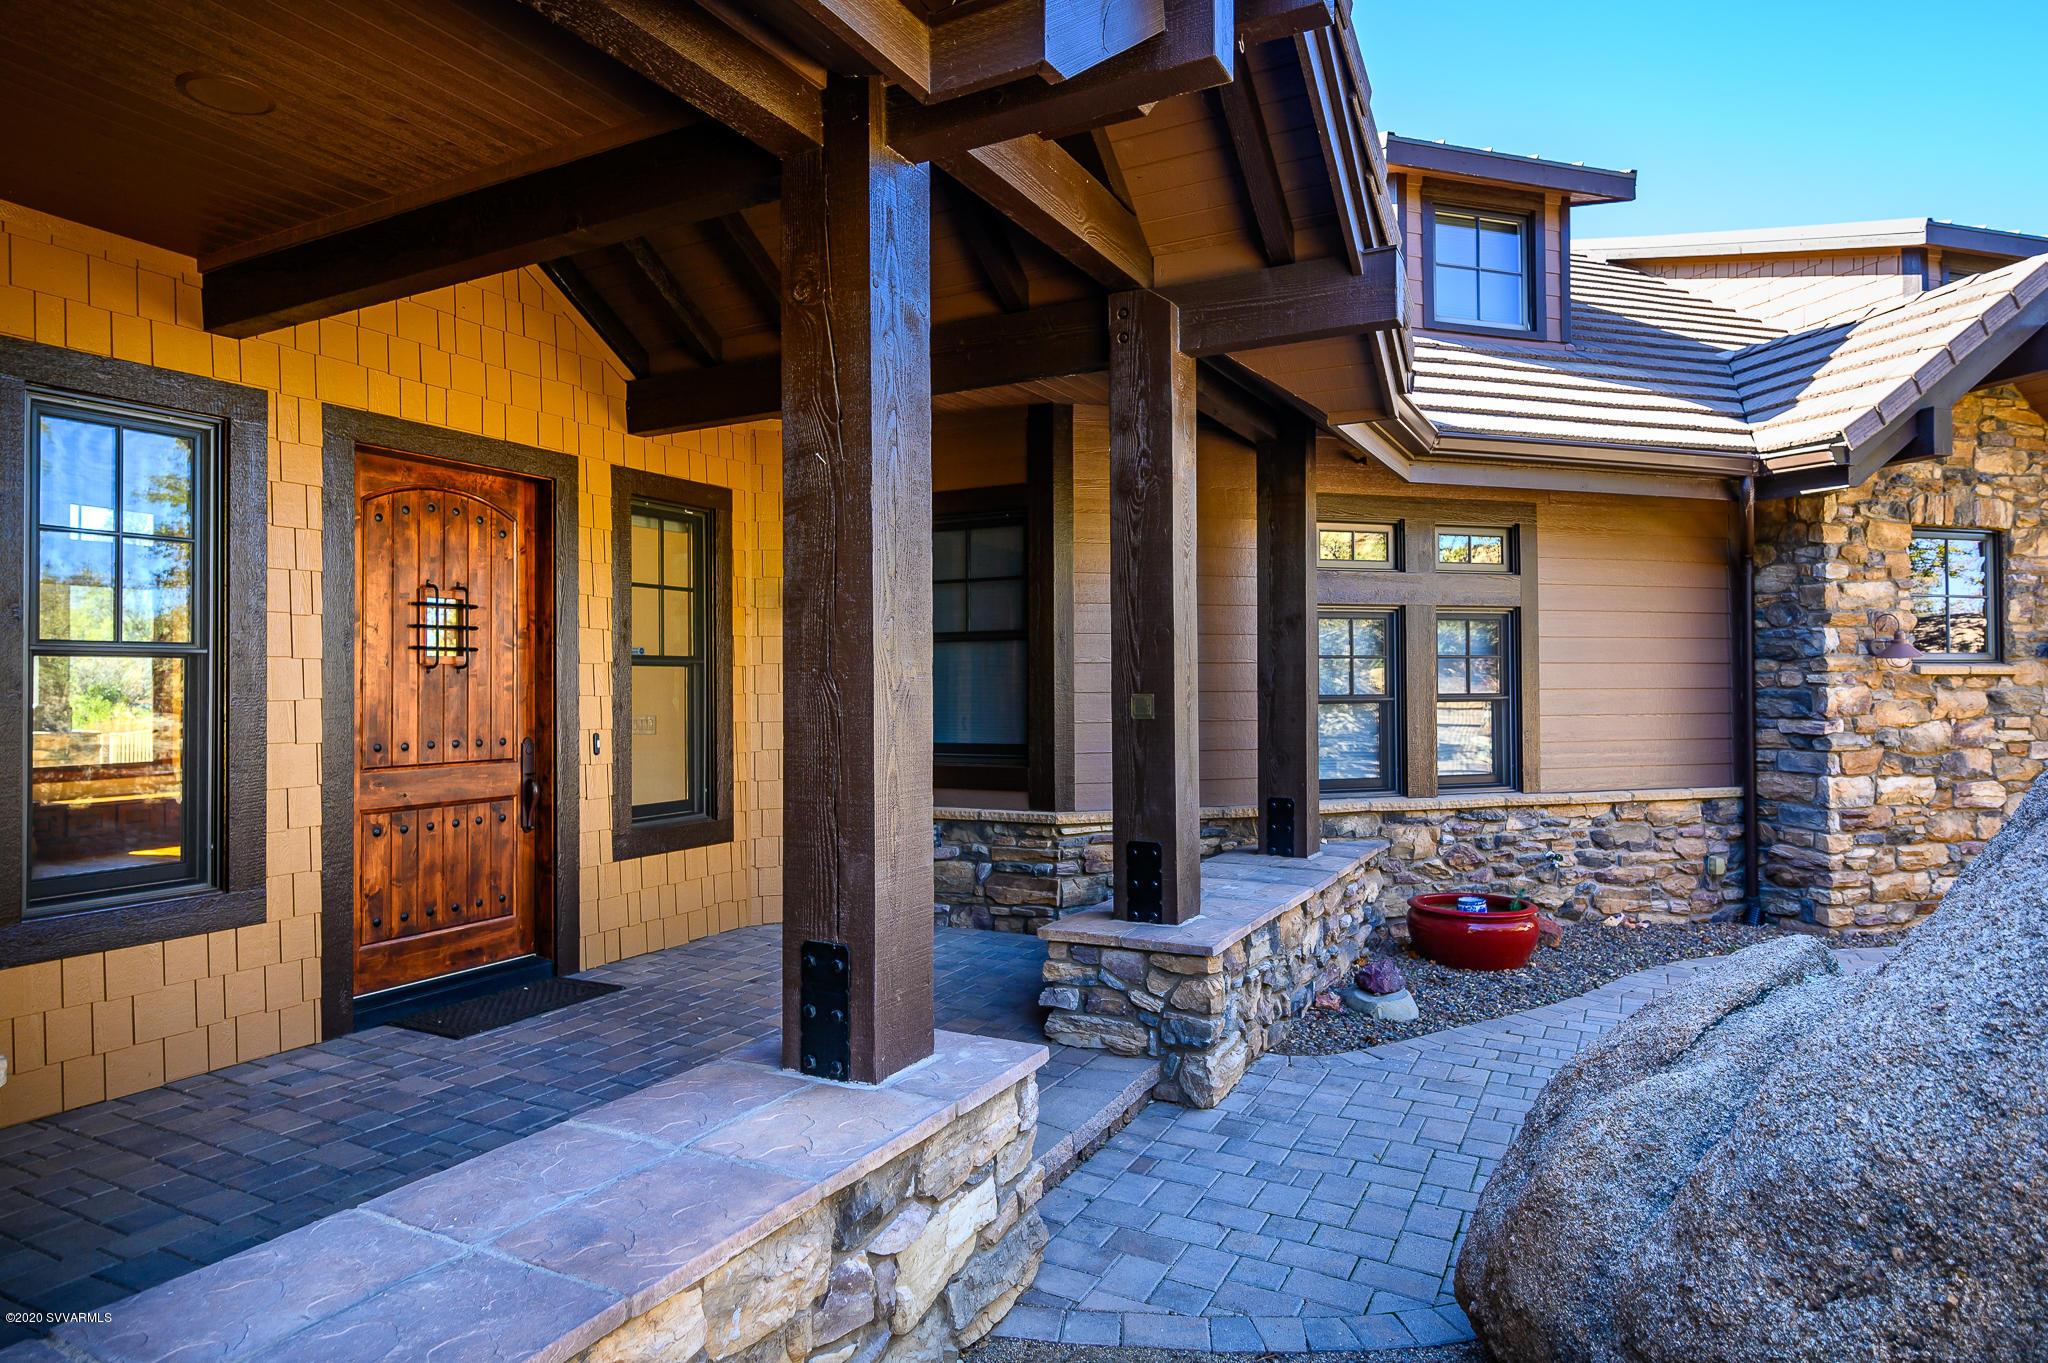 9640 N American Ranch Rd, Prescott, Arizona